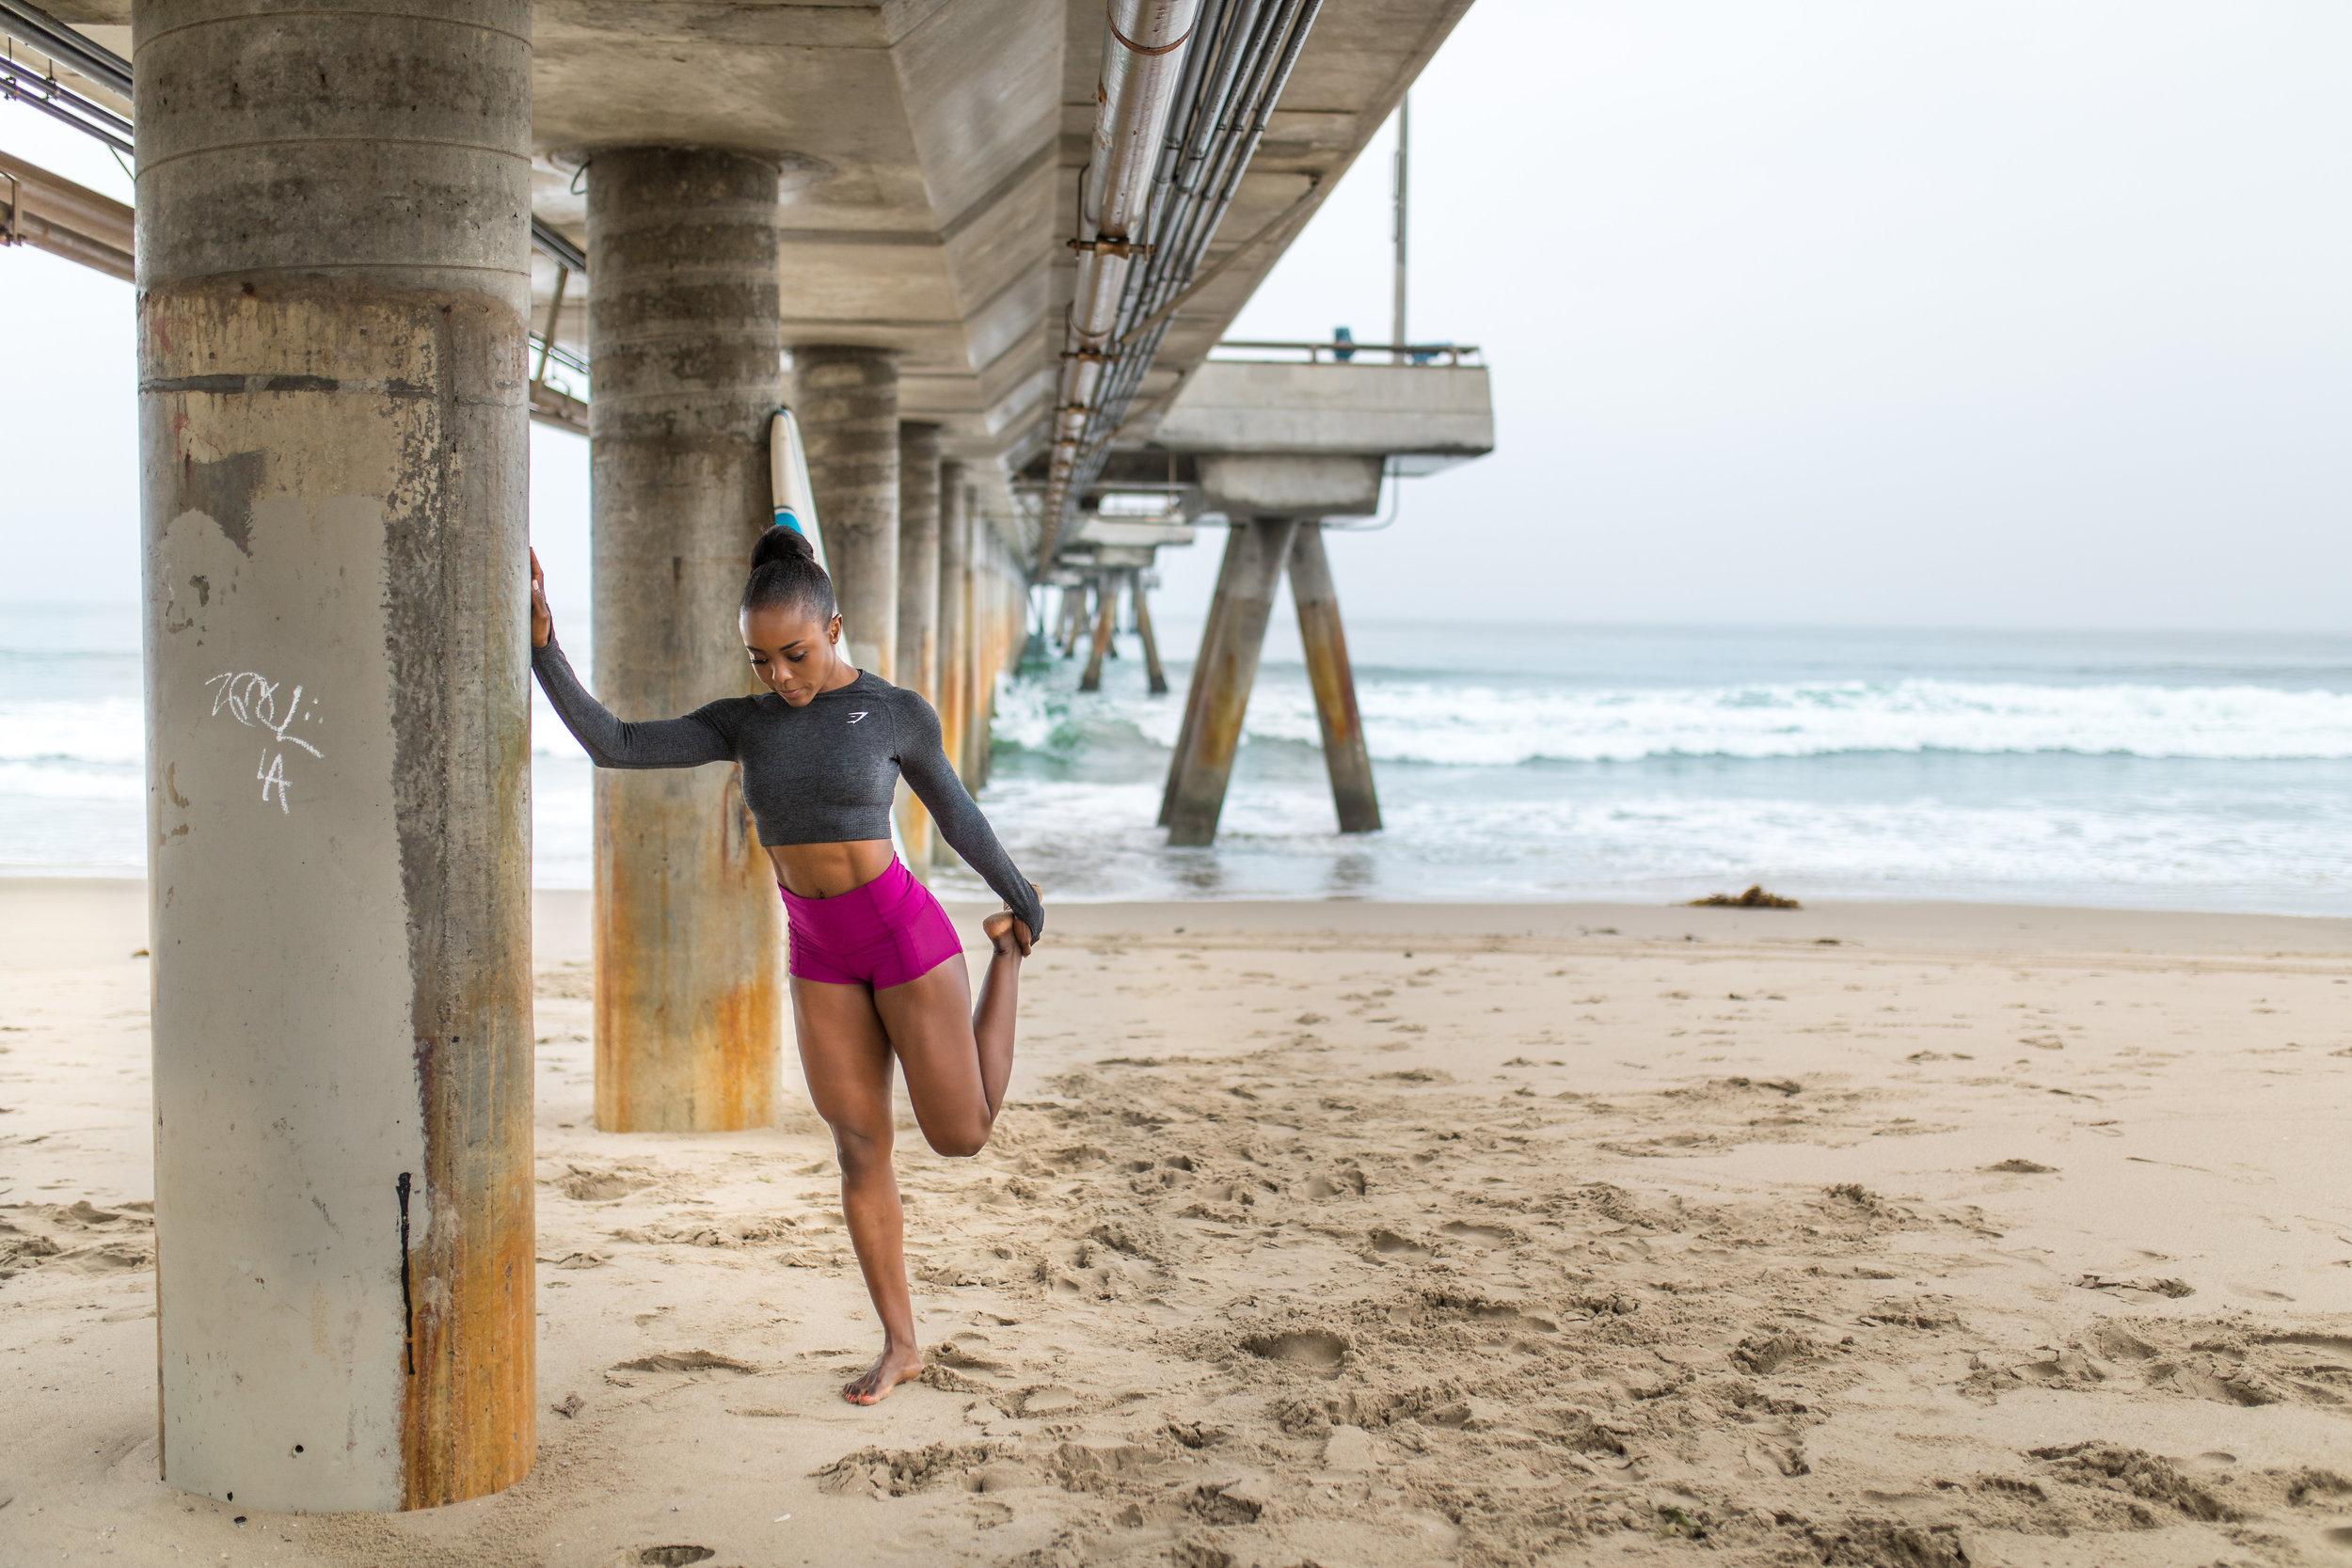 Livestrong_Surf Workout-18.JPG